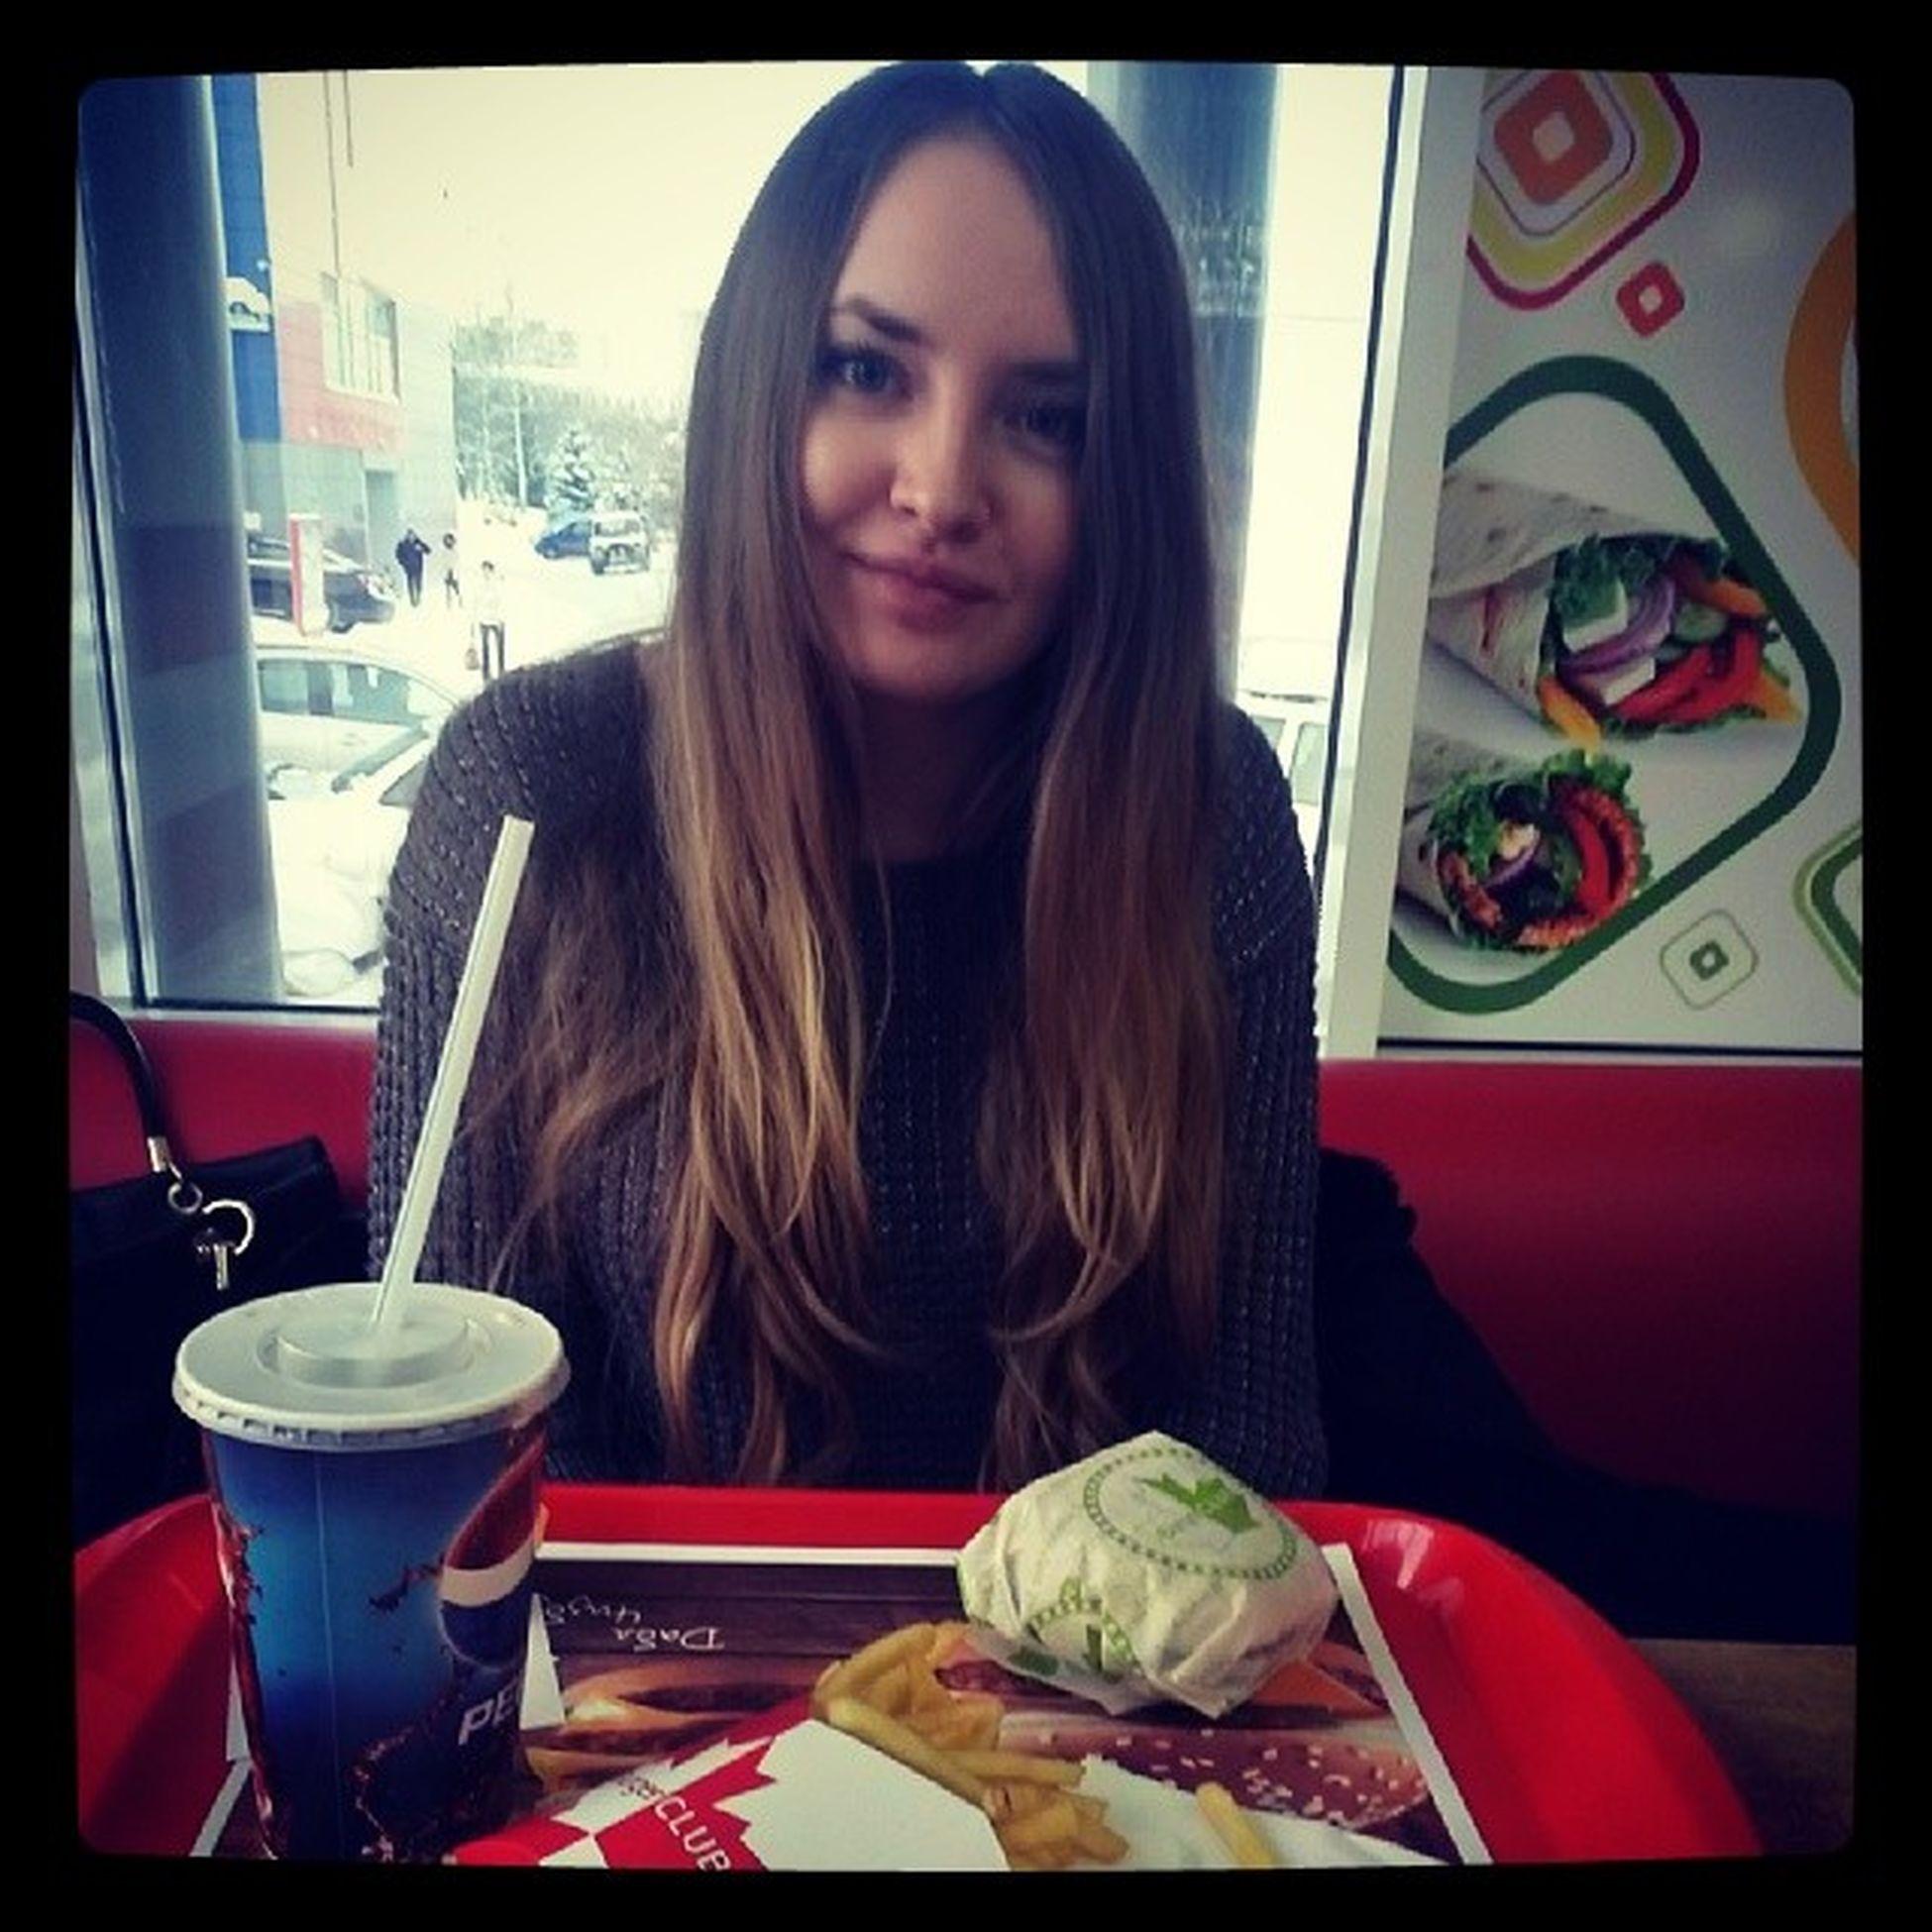 На обеде Burgerclub Instalike Instagirl Burgerbecon картофельфри cocacola girl